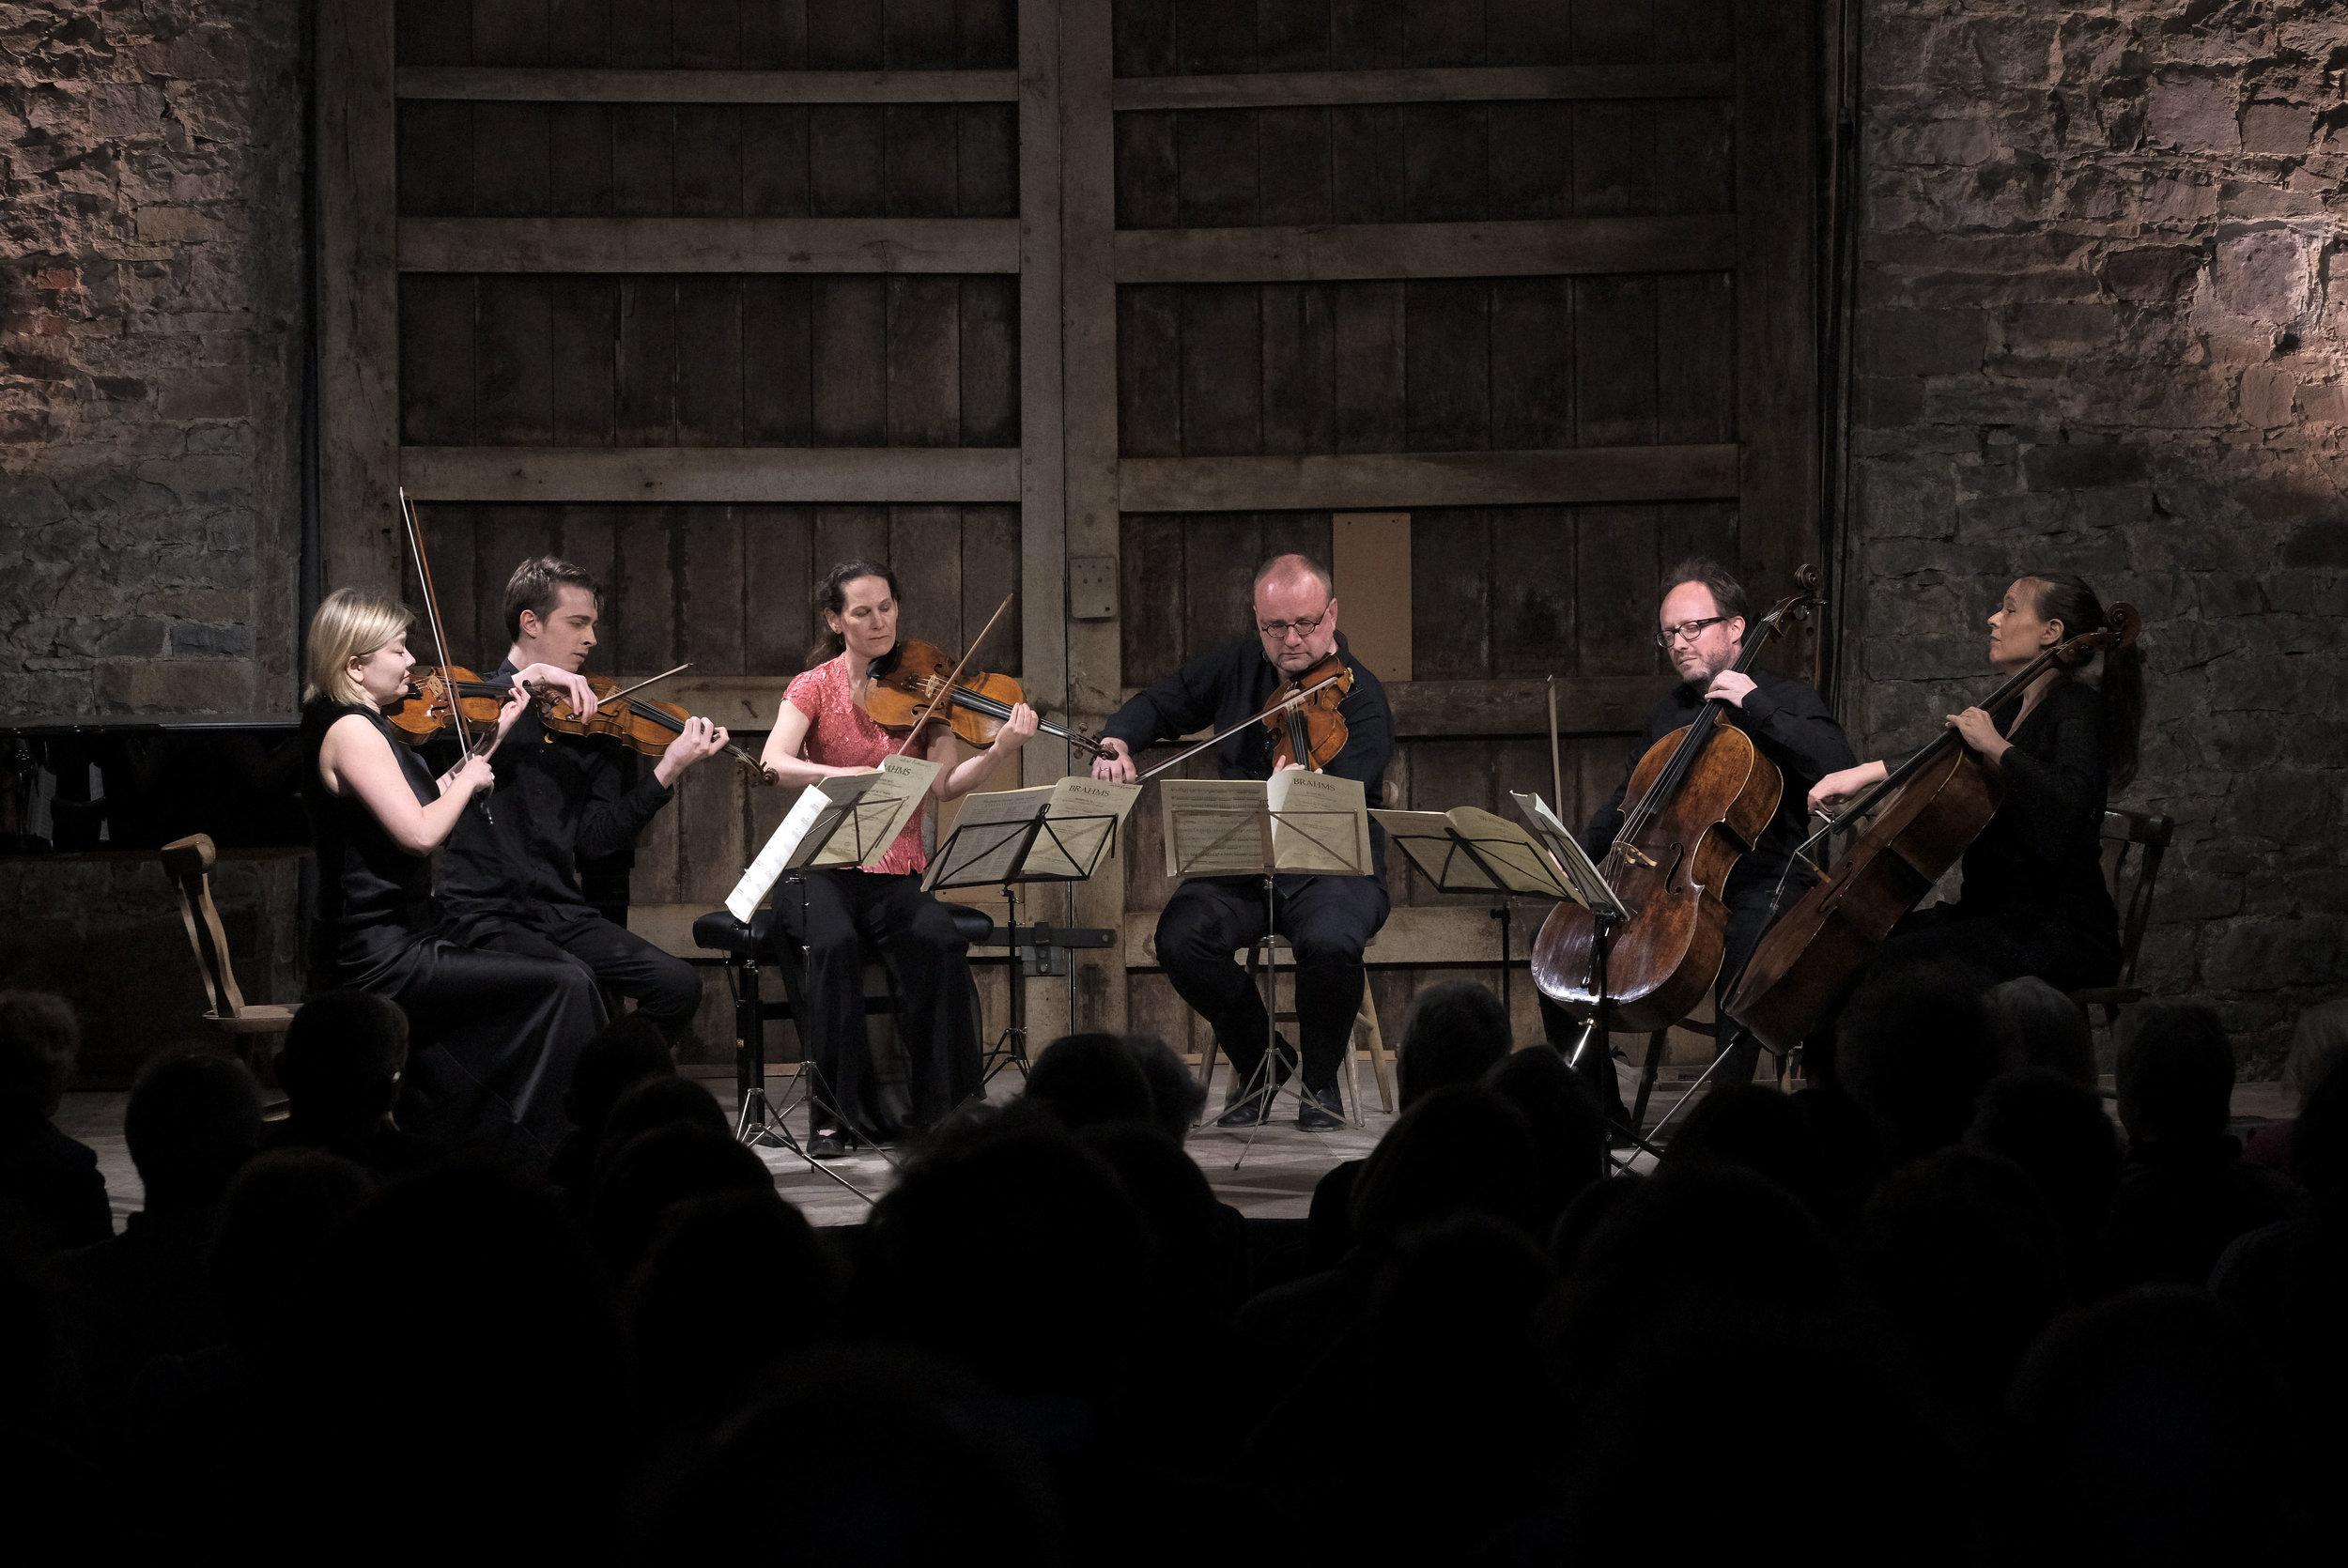 Alina Ibragimova, Tim Crawford (violons), Malin Broman, Tony Nijs (alto), Amy Norrington, Raphael Bell (violoncelle)